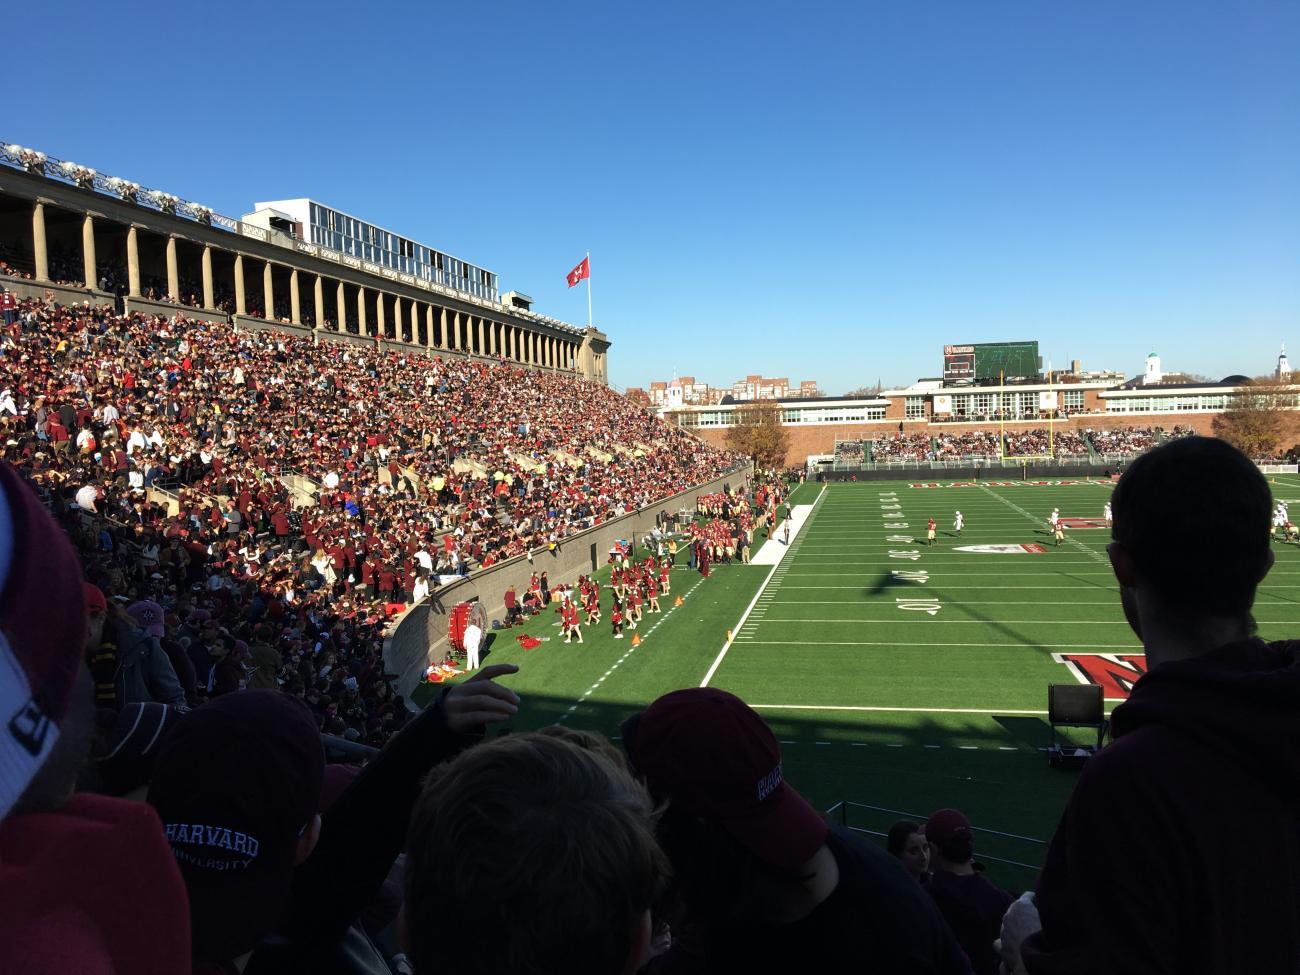 2016 Harvard-Yale football game in the Harvard Stadium